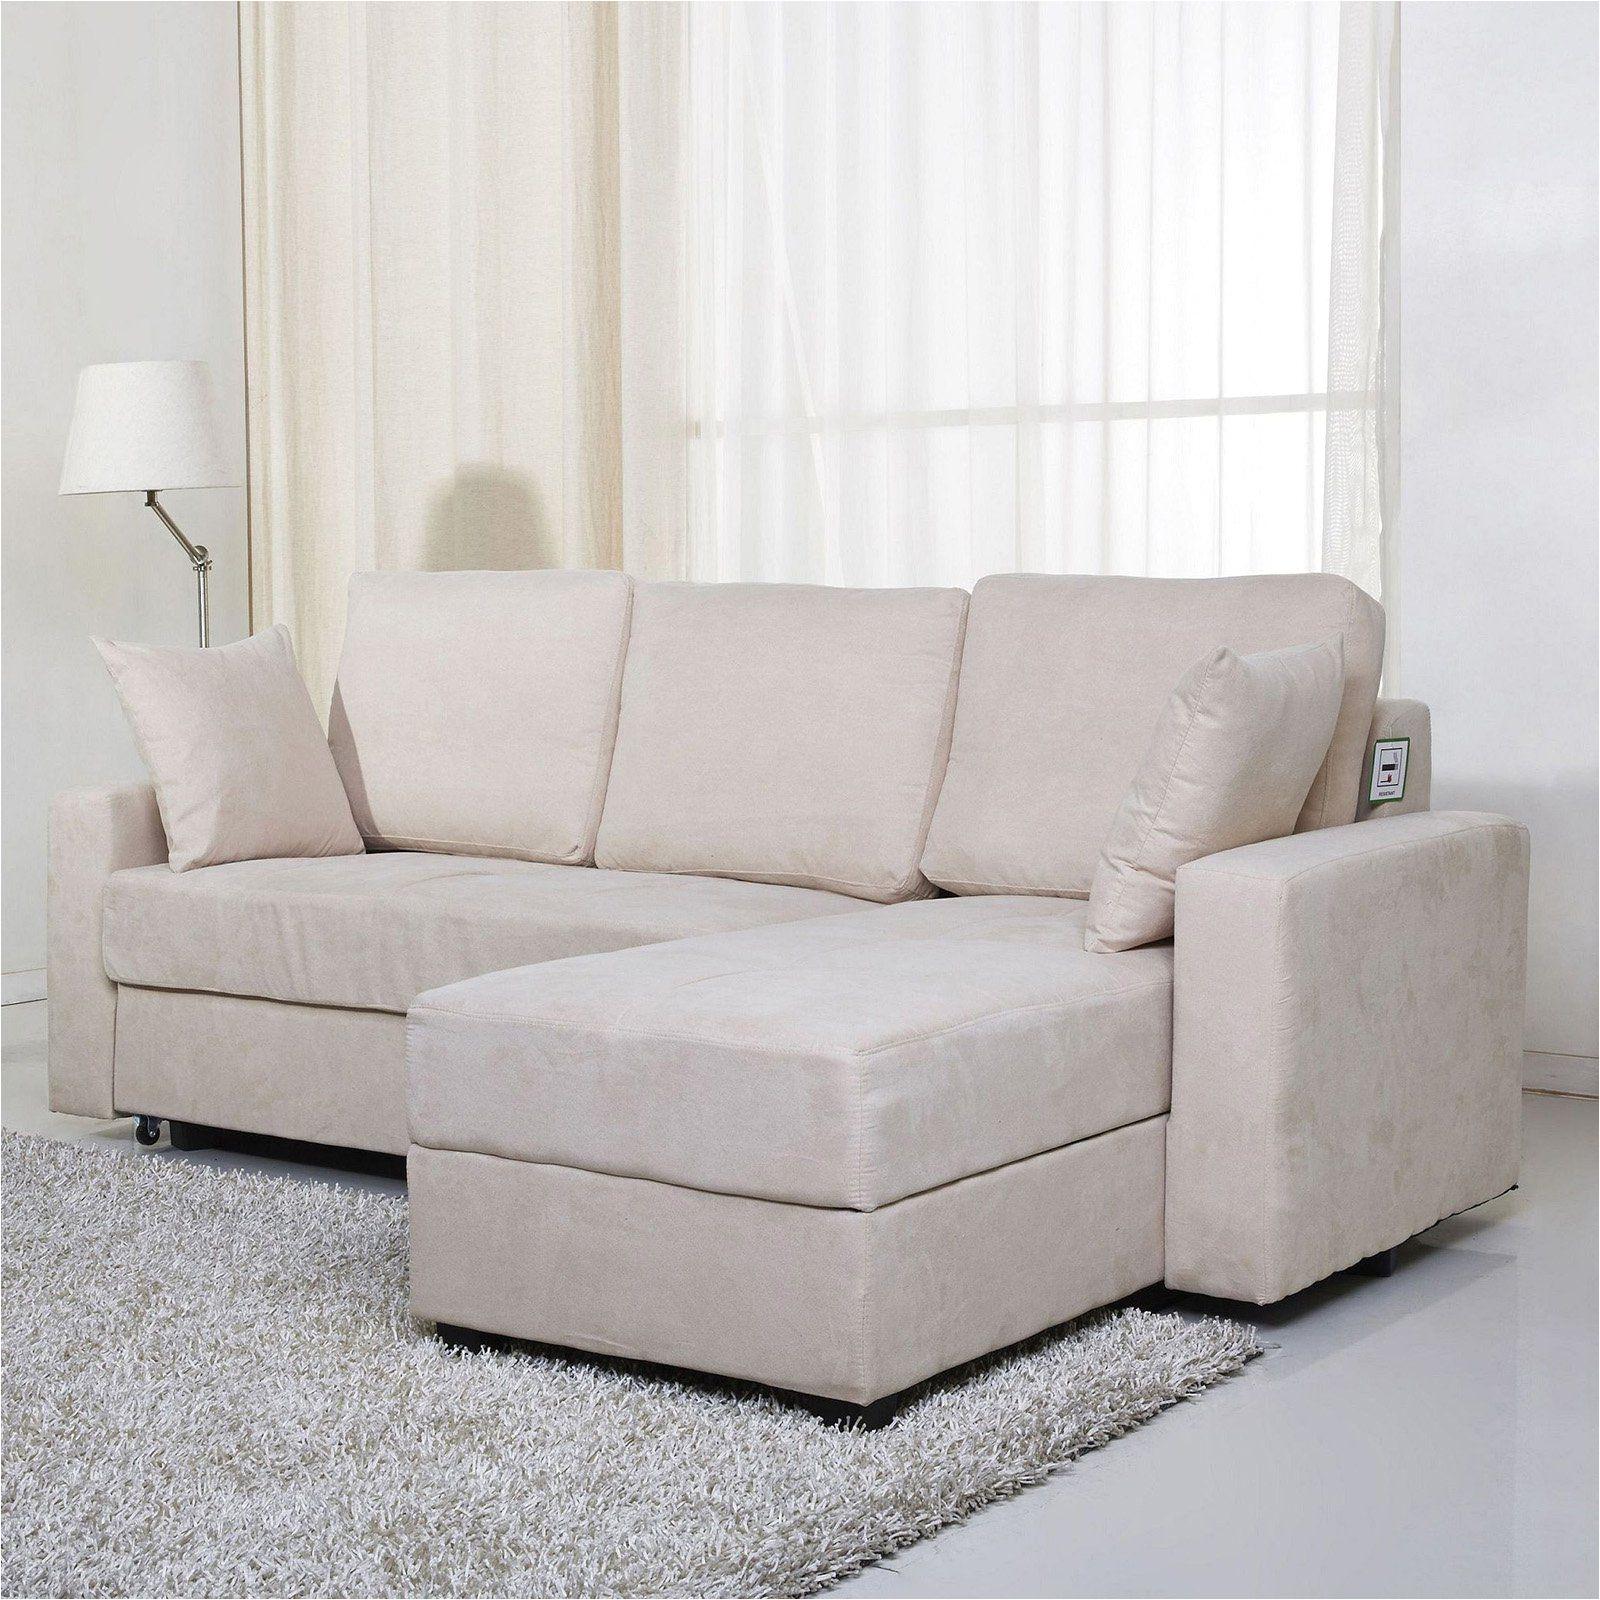 gold sparrow aspen convertible storage sectional sofa adc asp sec pux blk